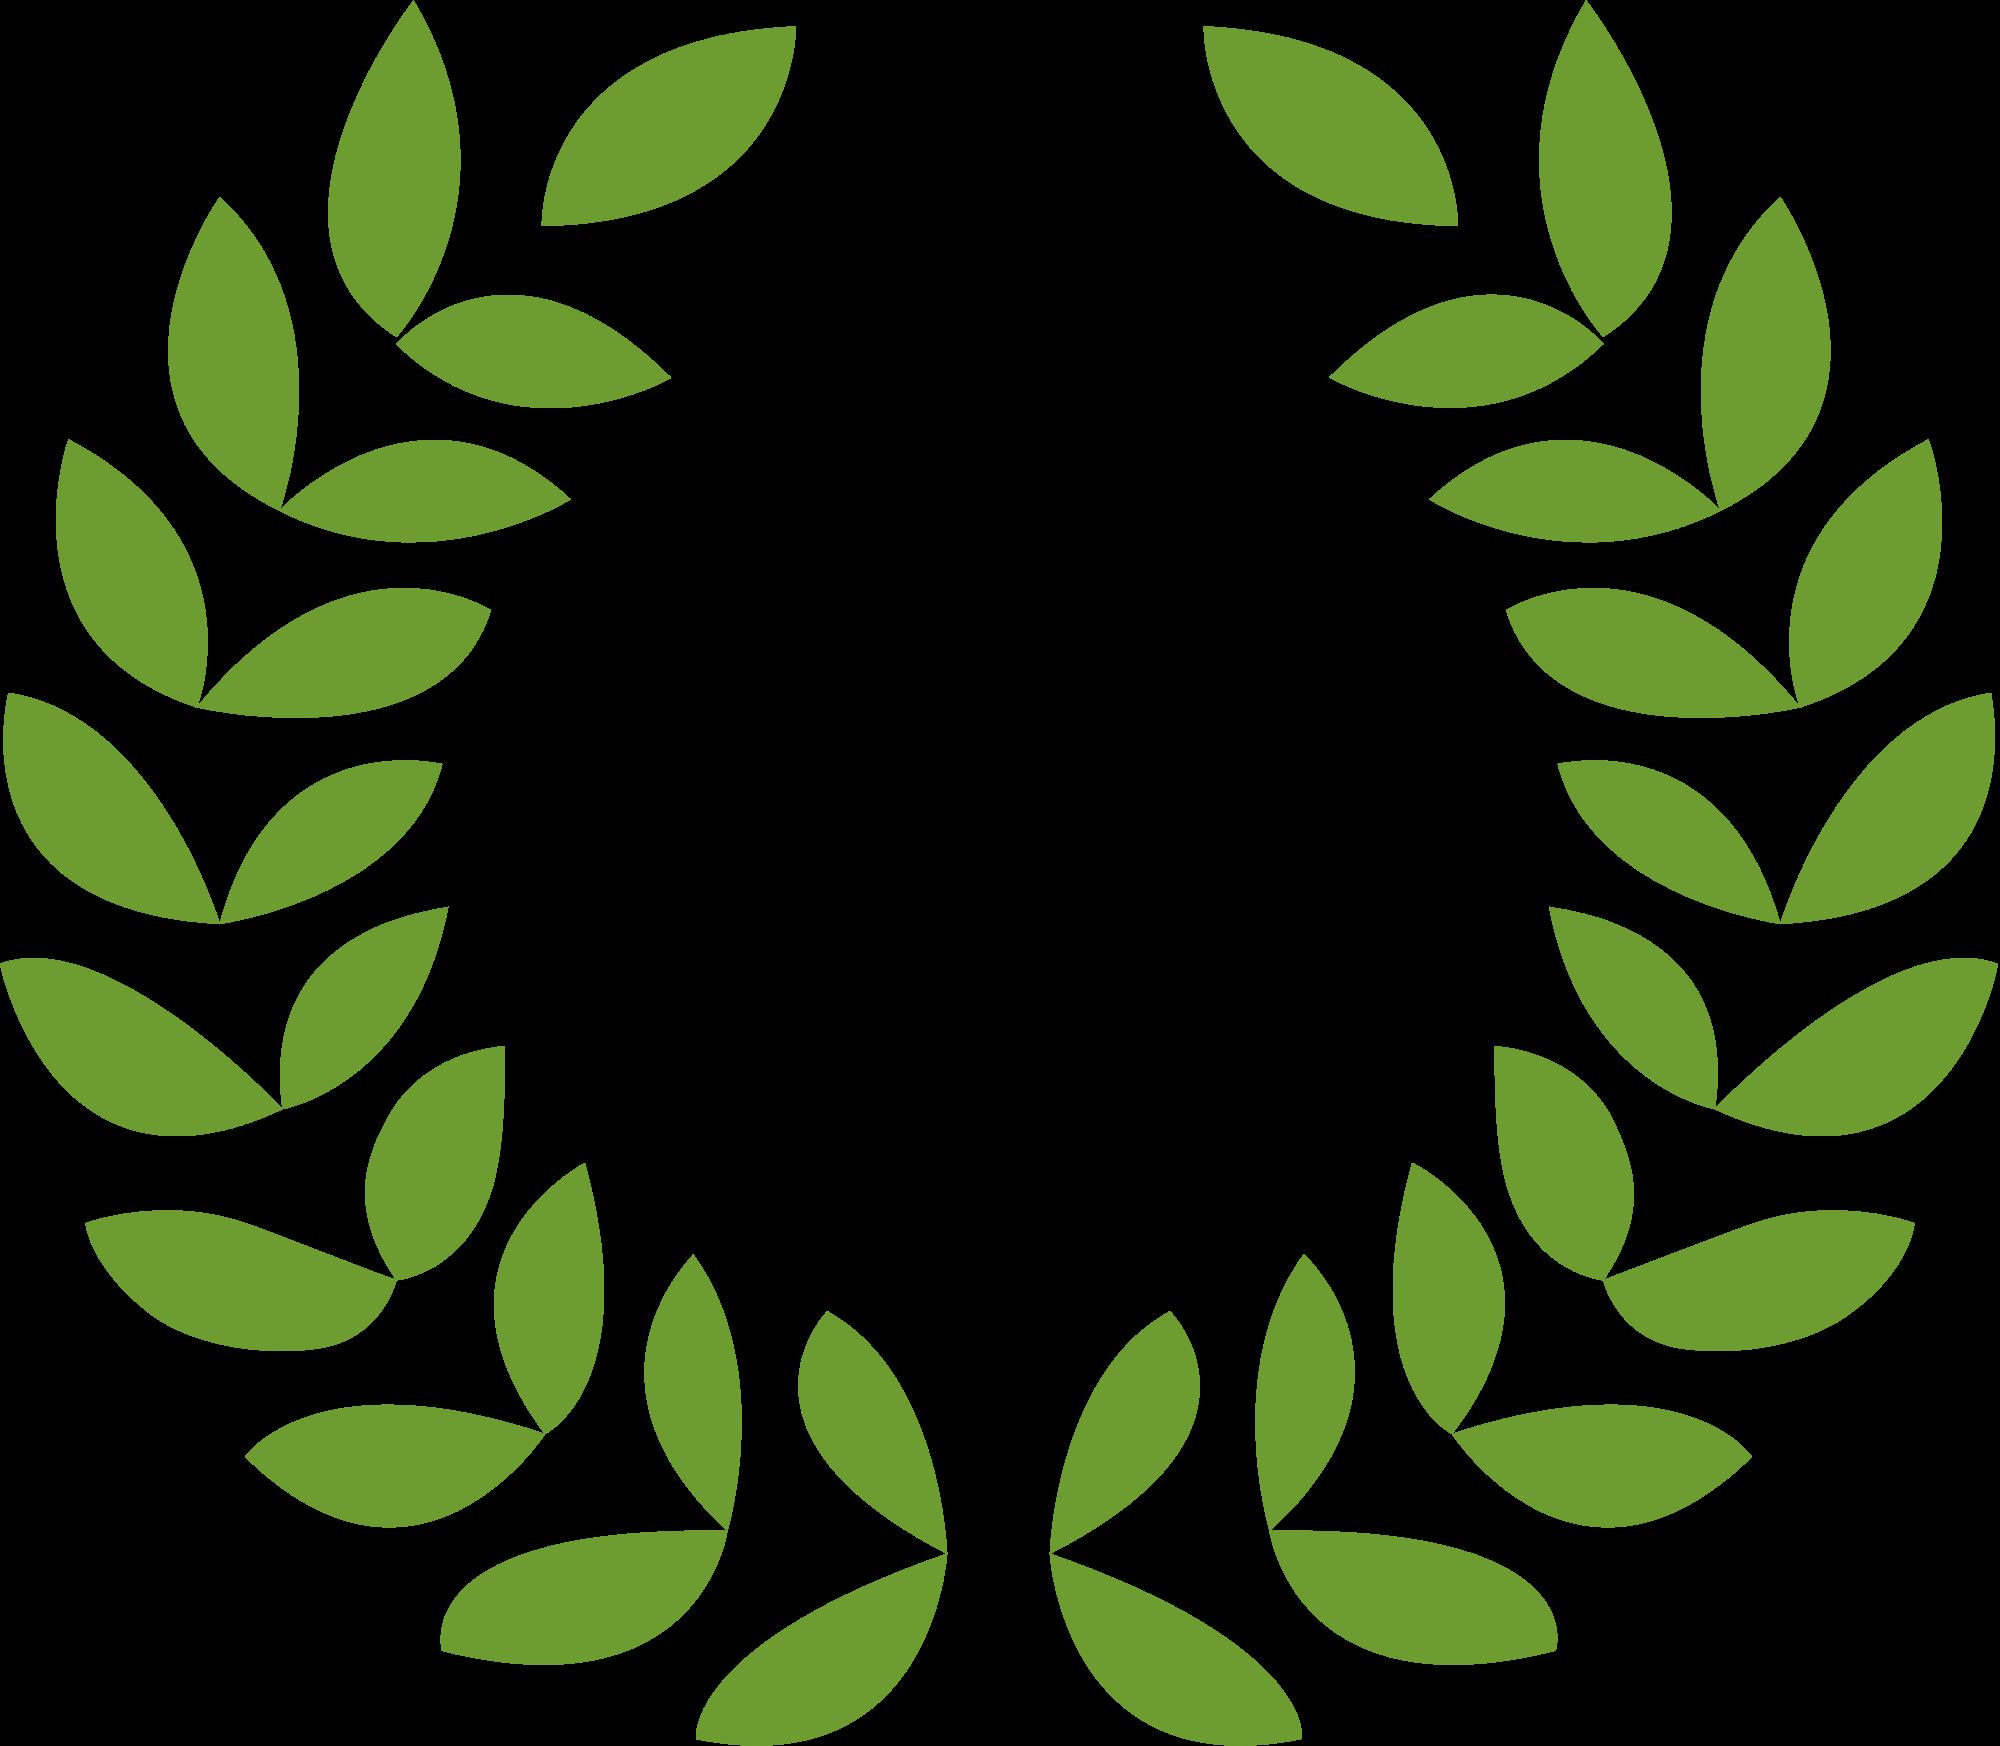 2000x1746 Leaf Clipart Roman